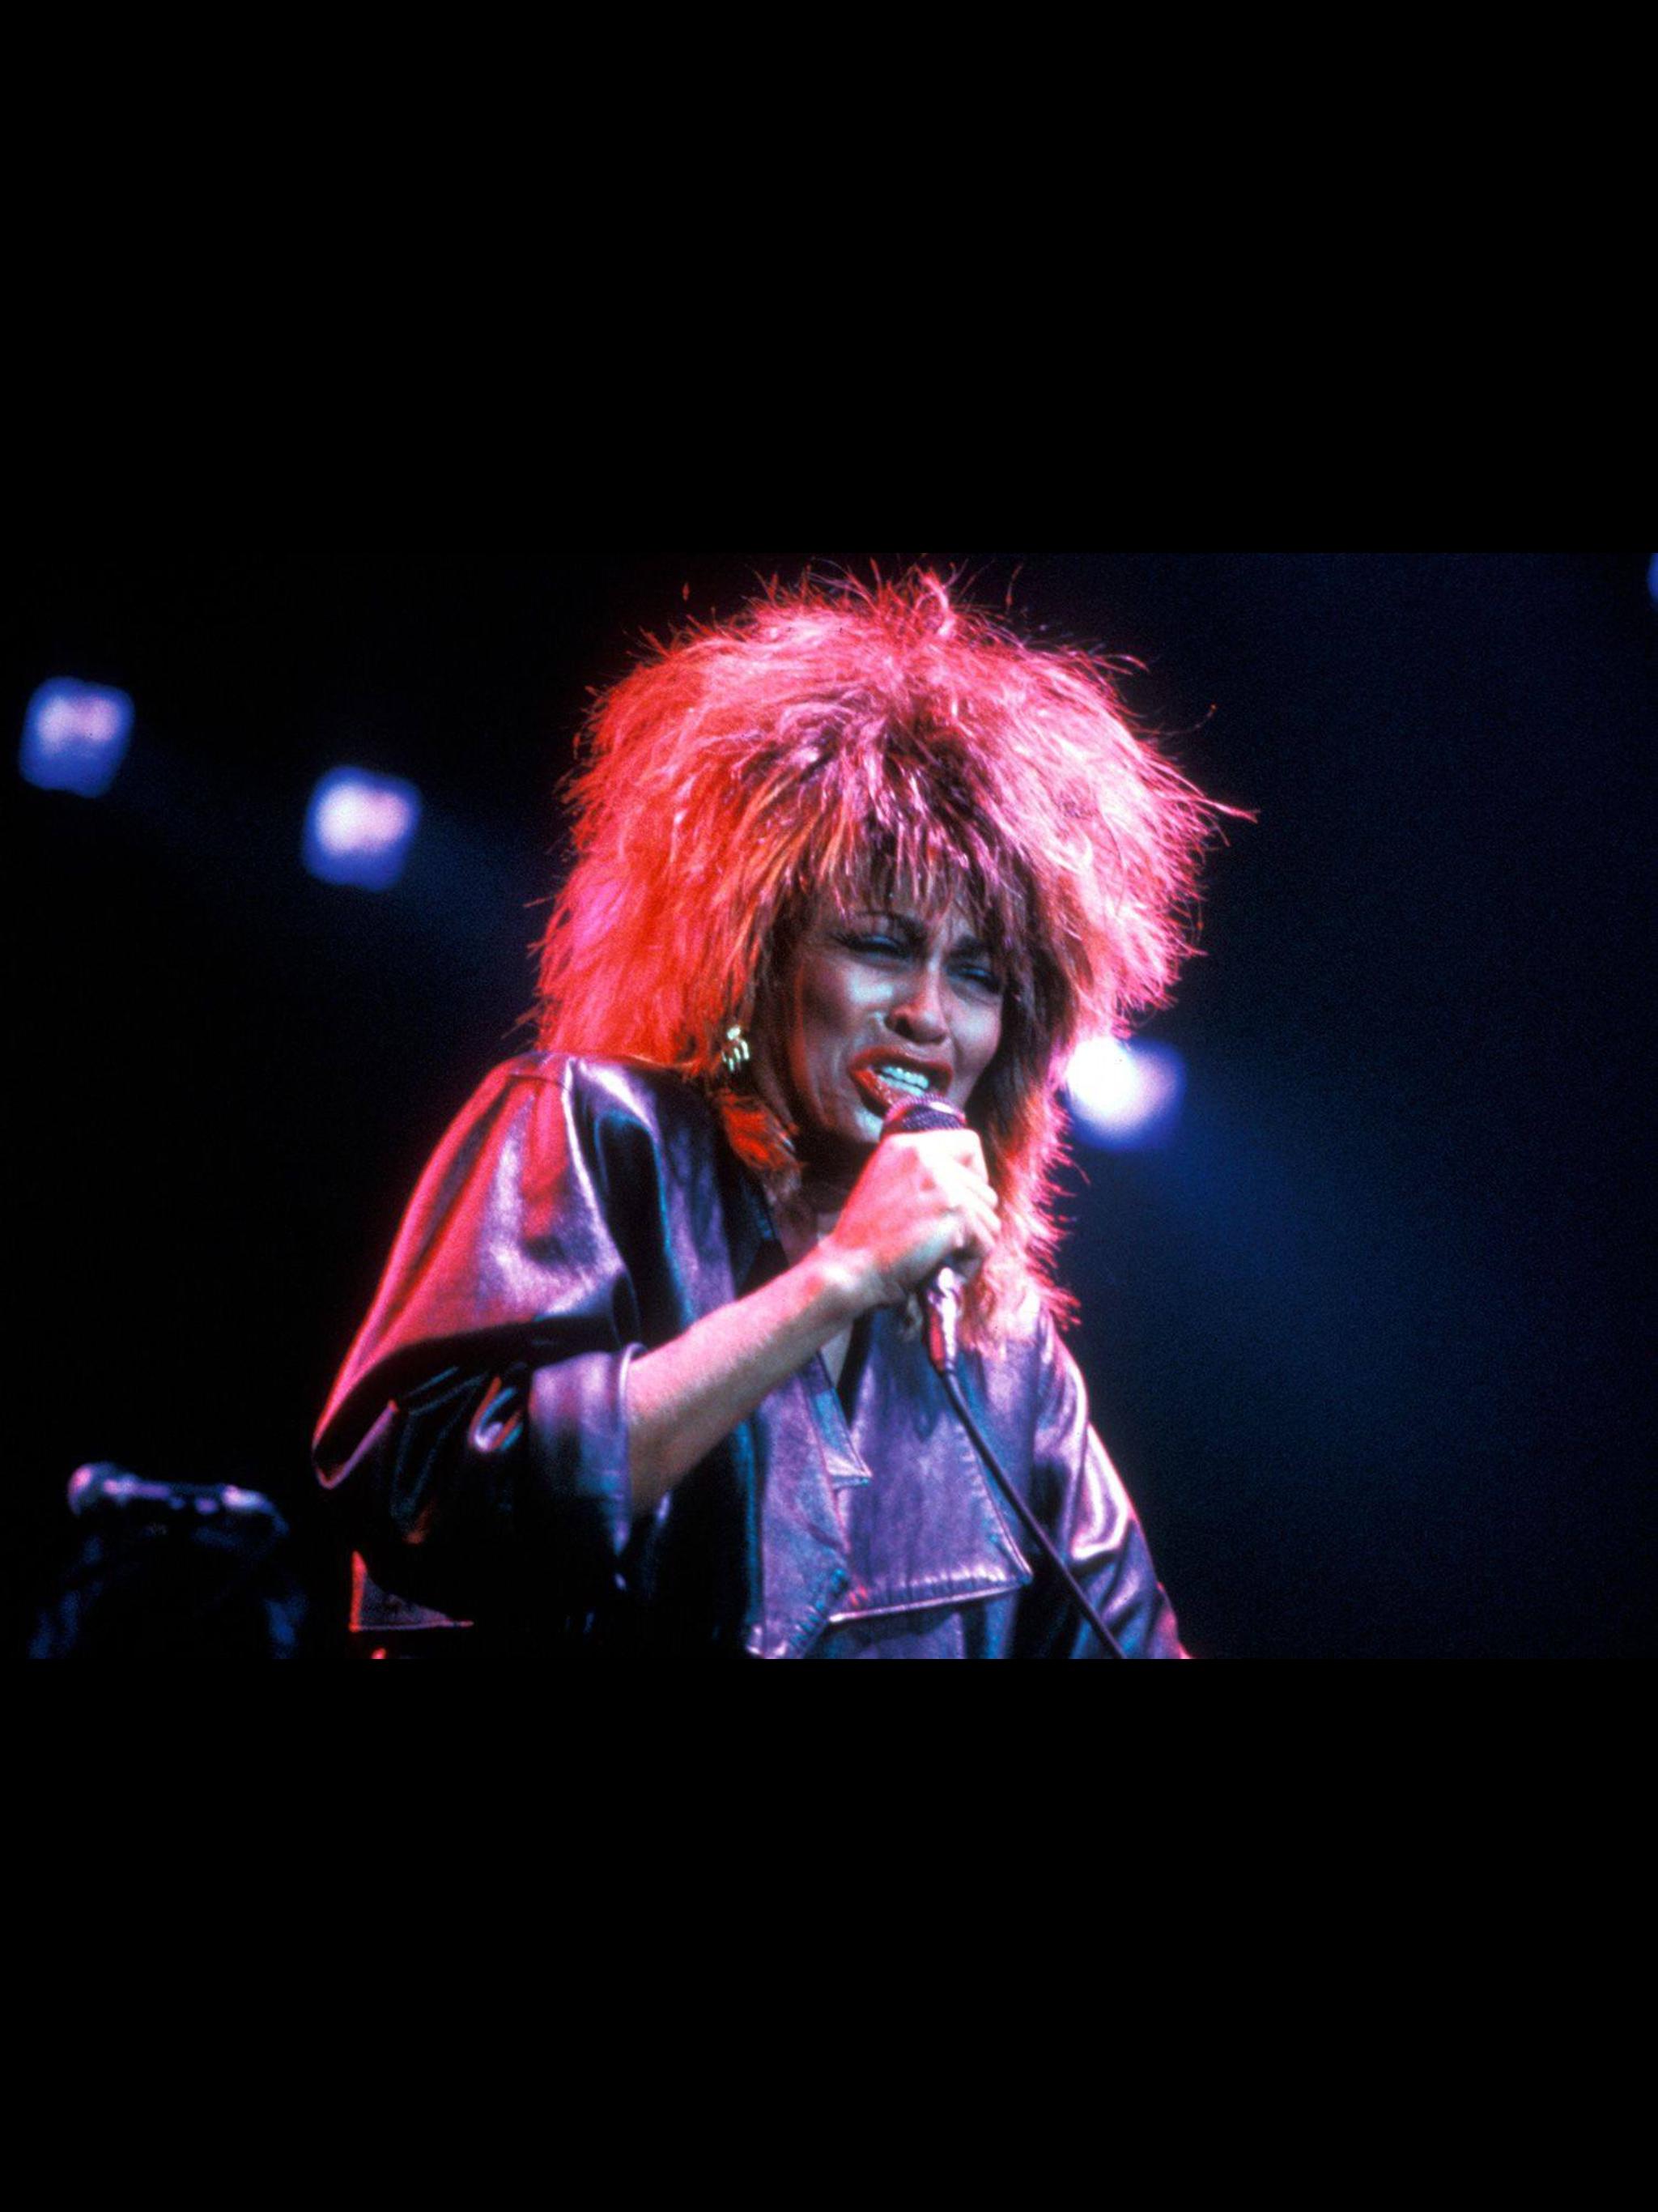 Tina Tina image by Barbara Matthews Female rock stars